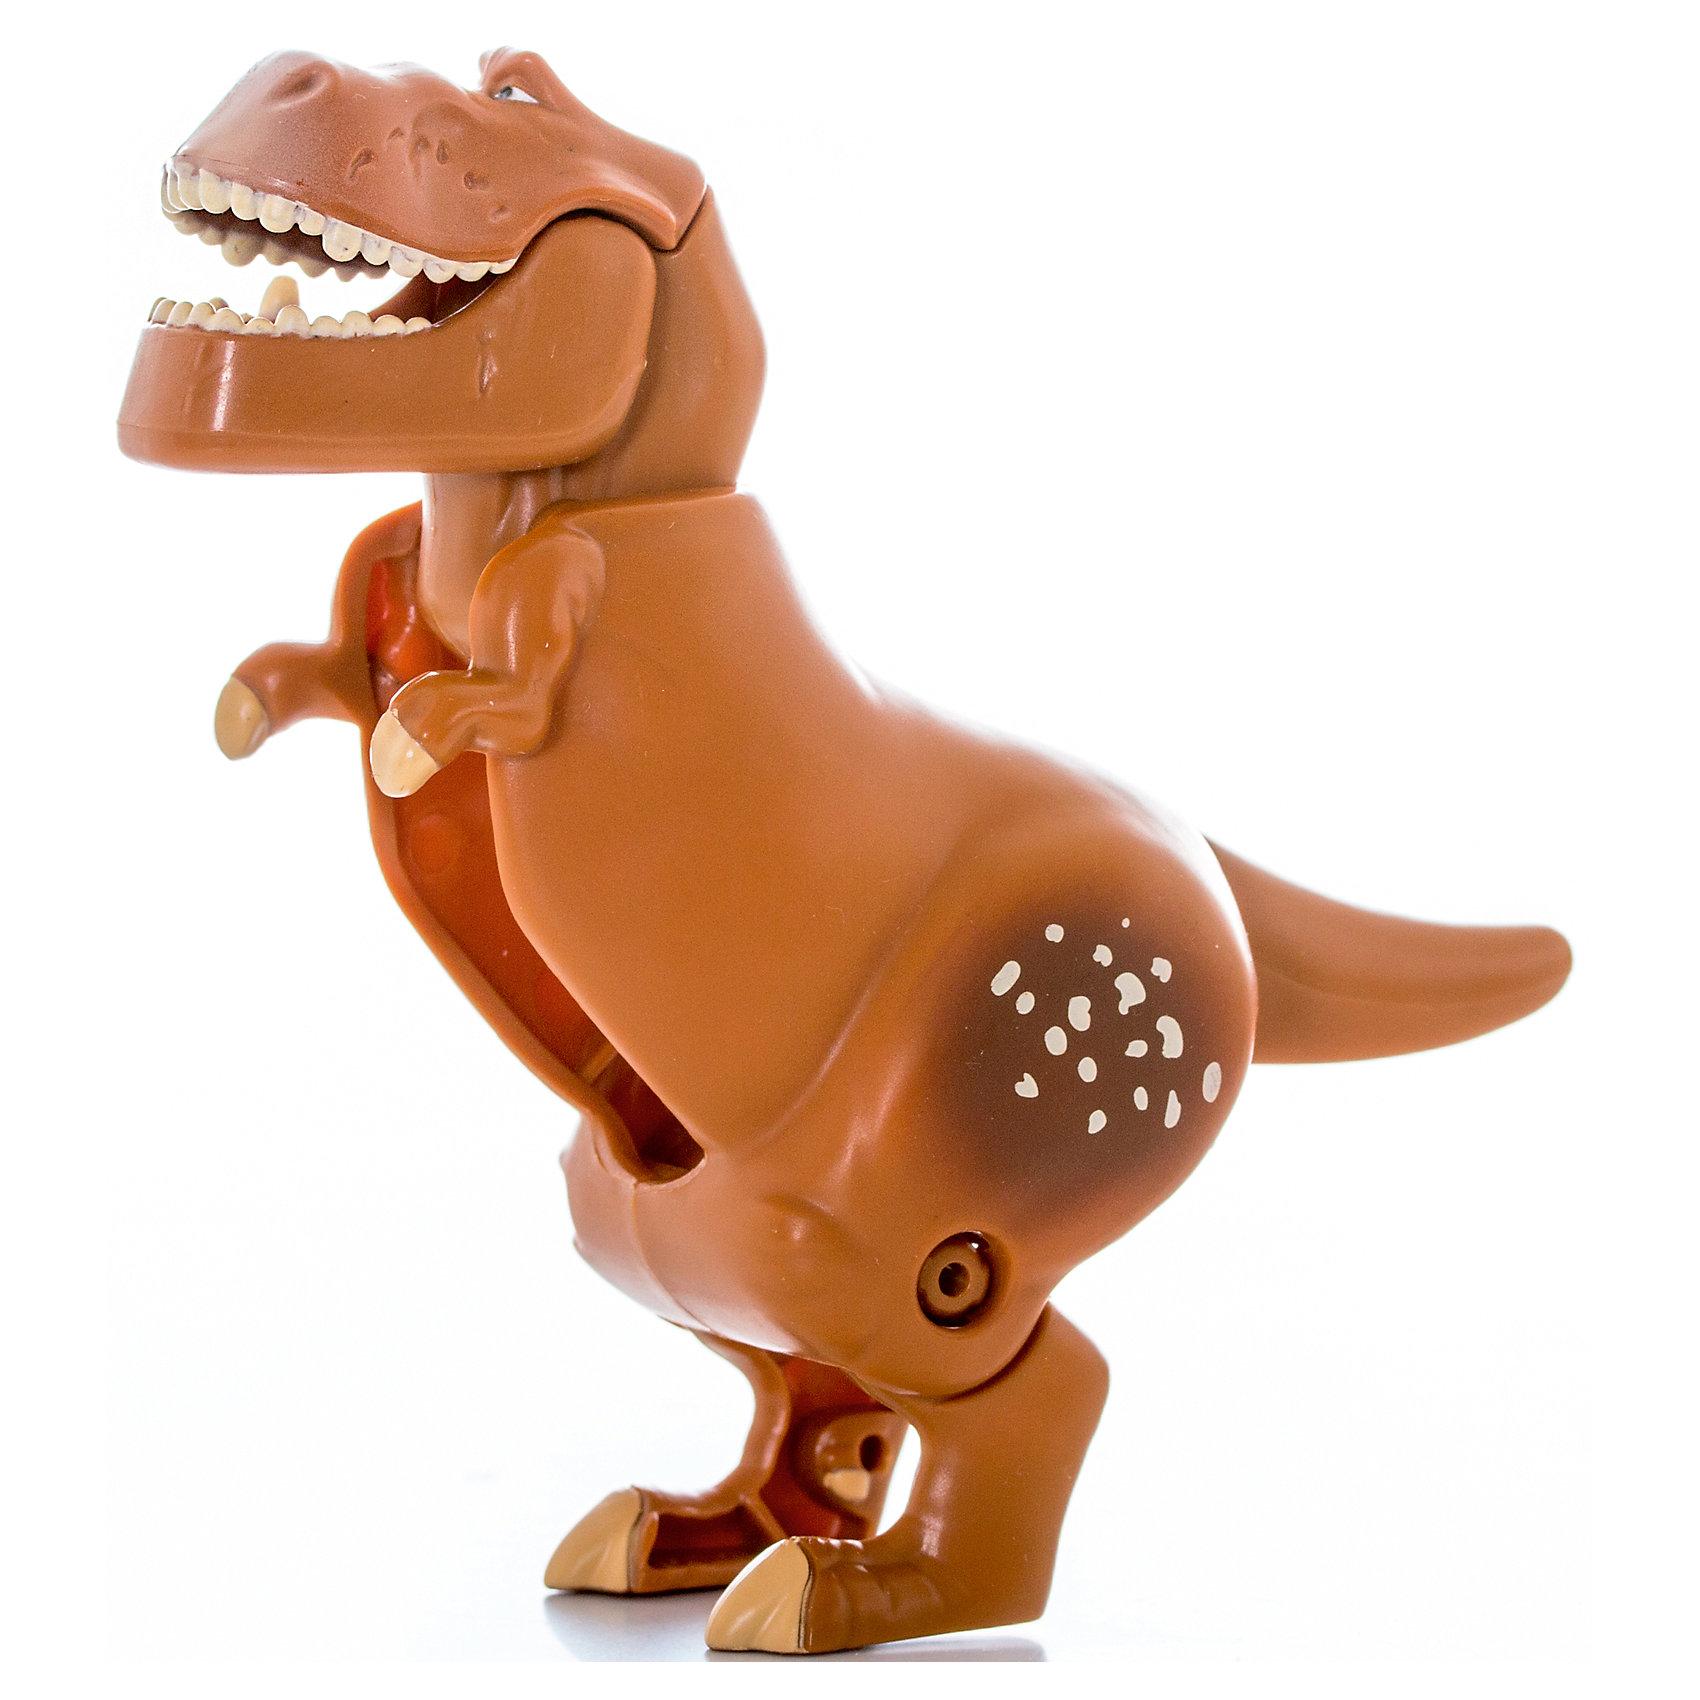 EggStars Яйцо-трансформер Бур,  Хороший динозавр, EggStars купить хороший недорогой фотоаппарат отзывы